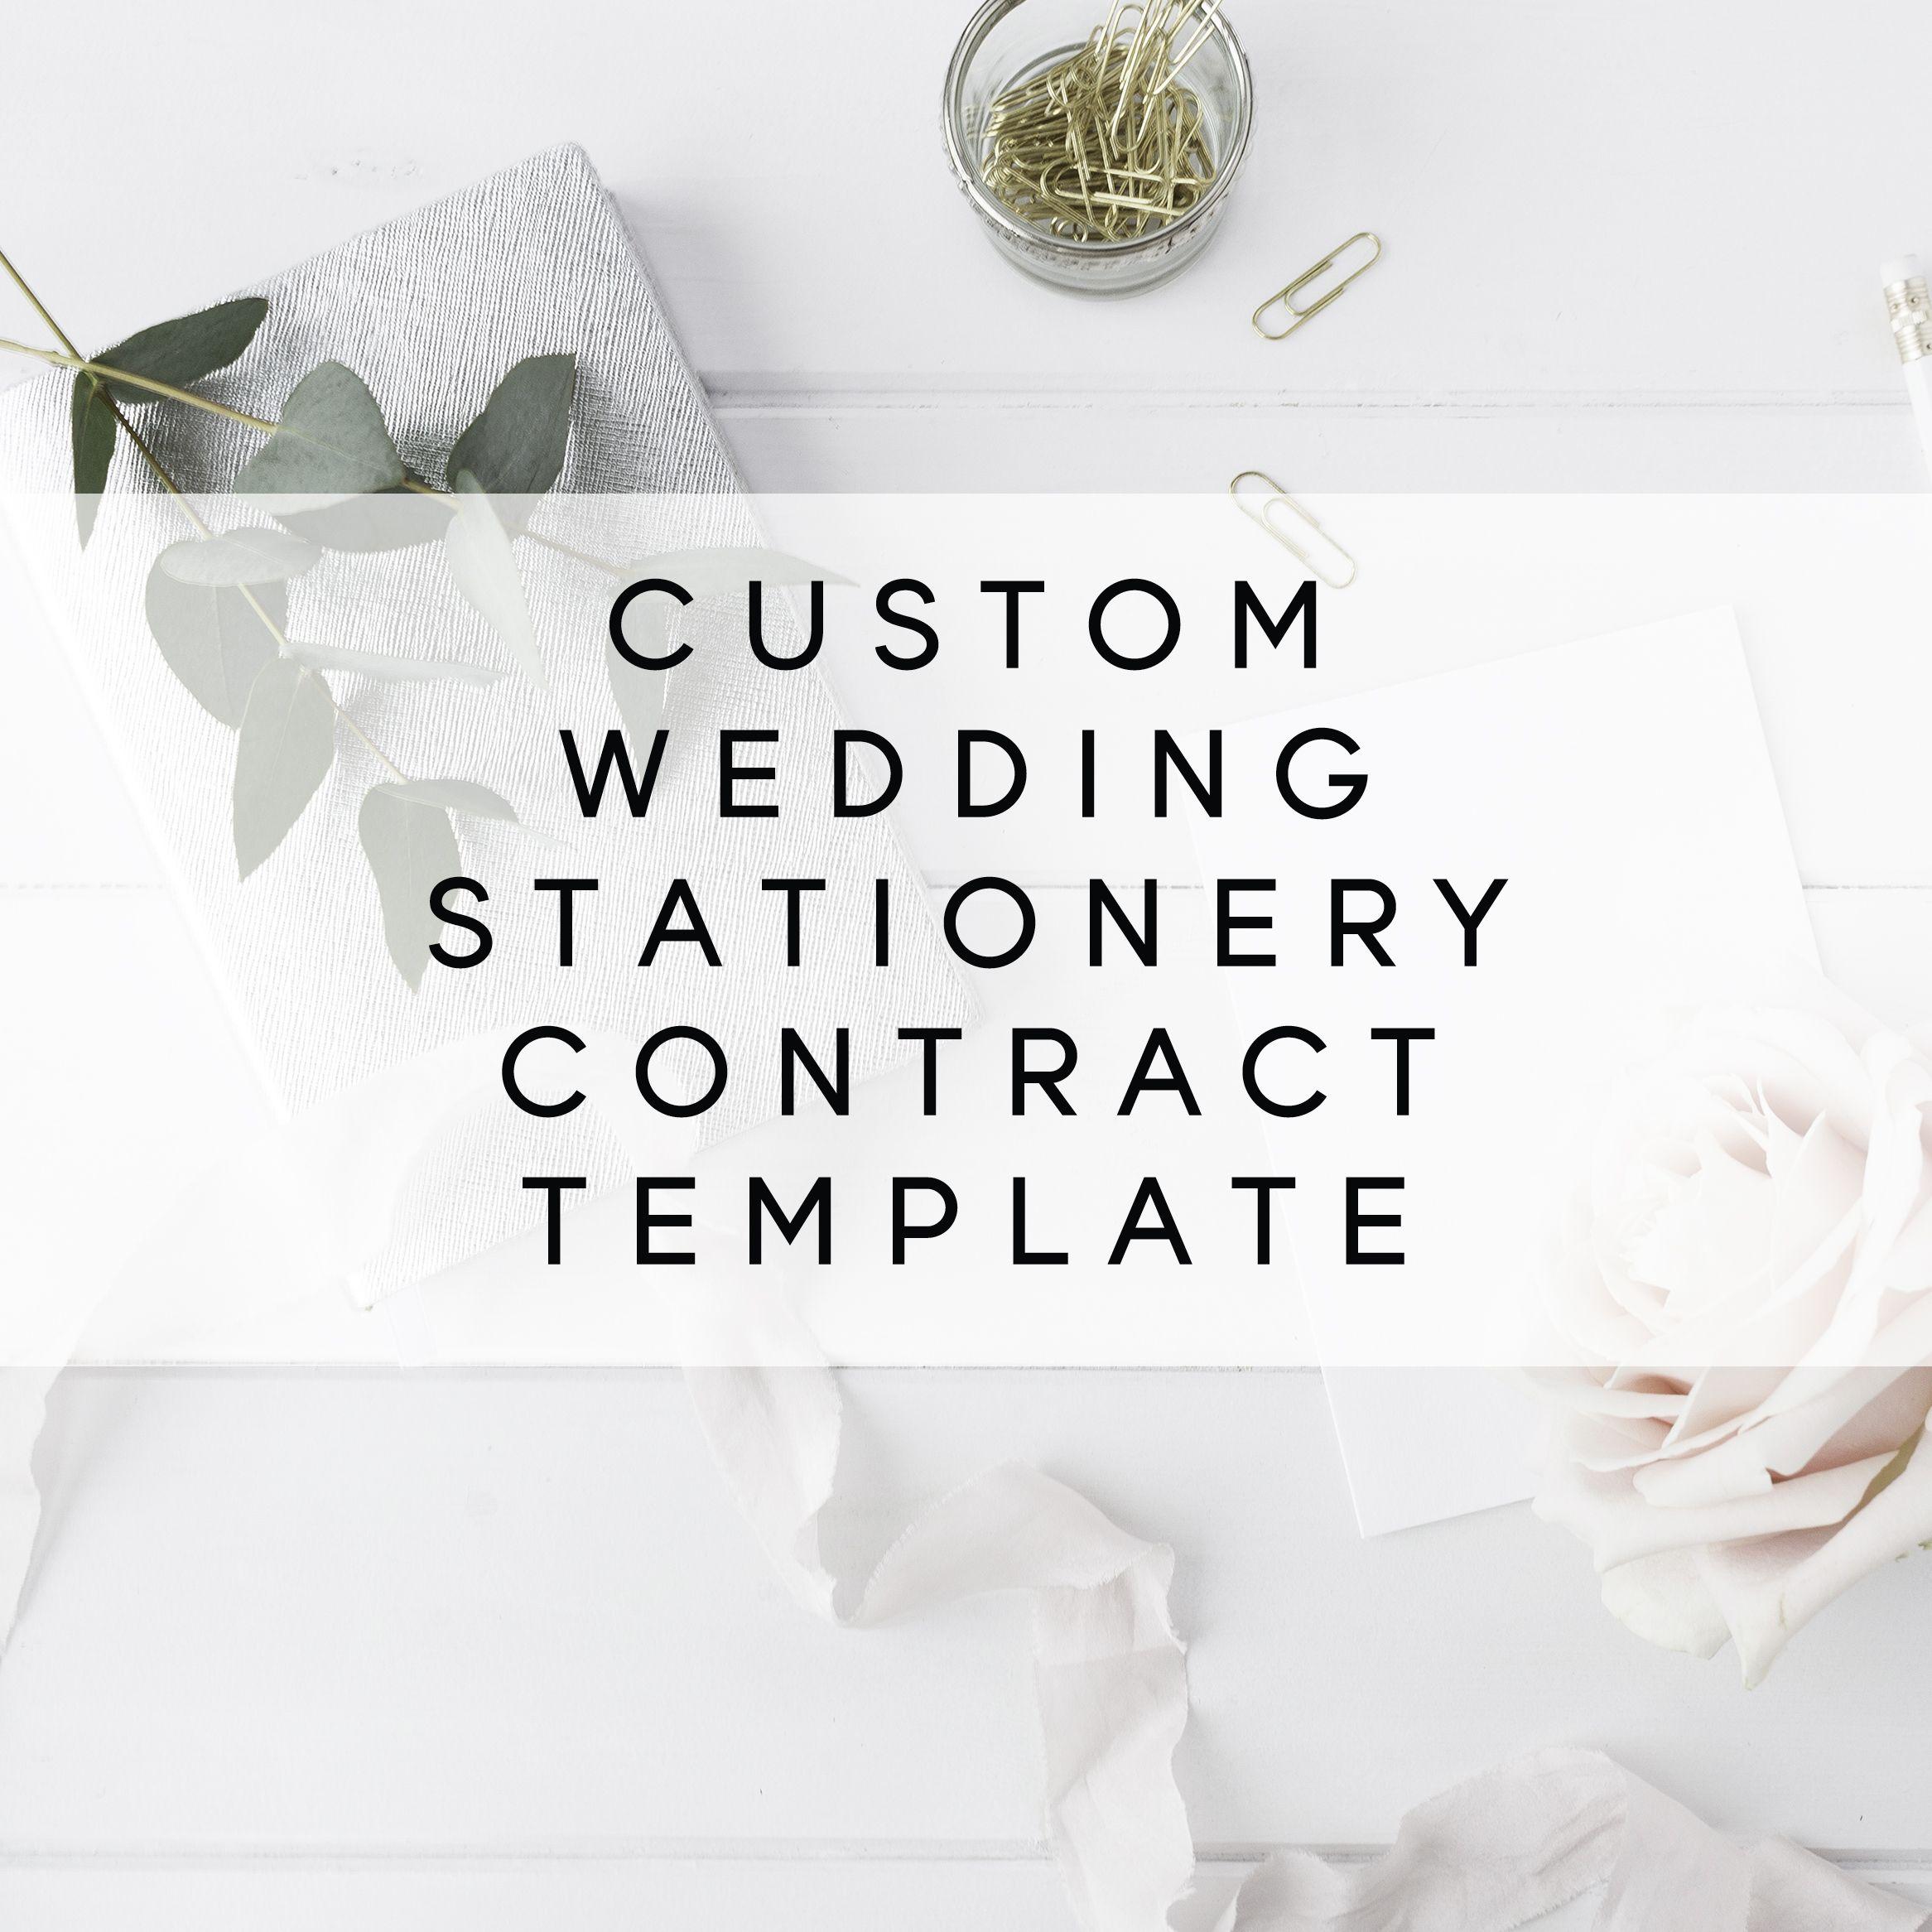 Custom wedding stationery contract template legal tips for custom wedding stationery contract template stopboris Choice Image